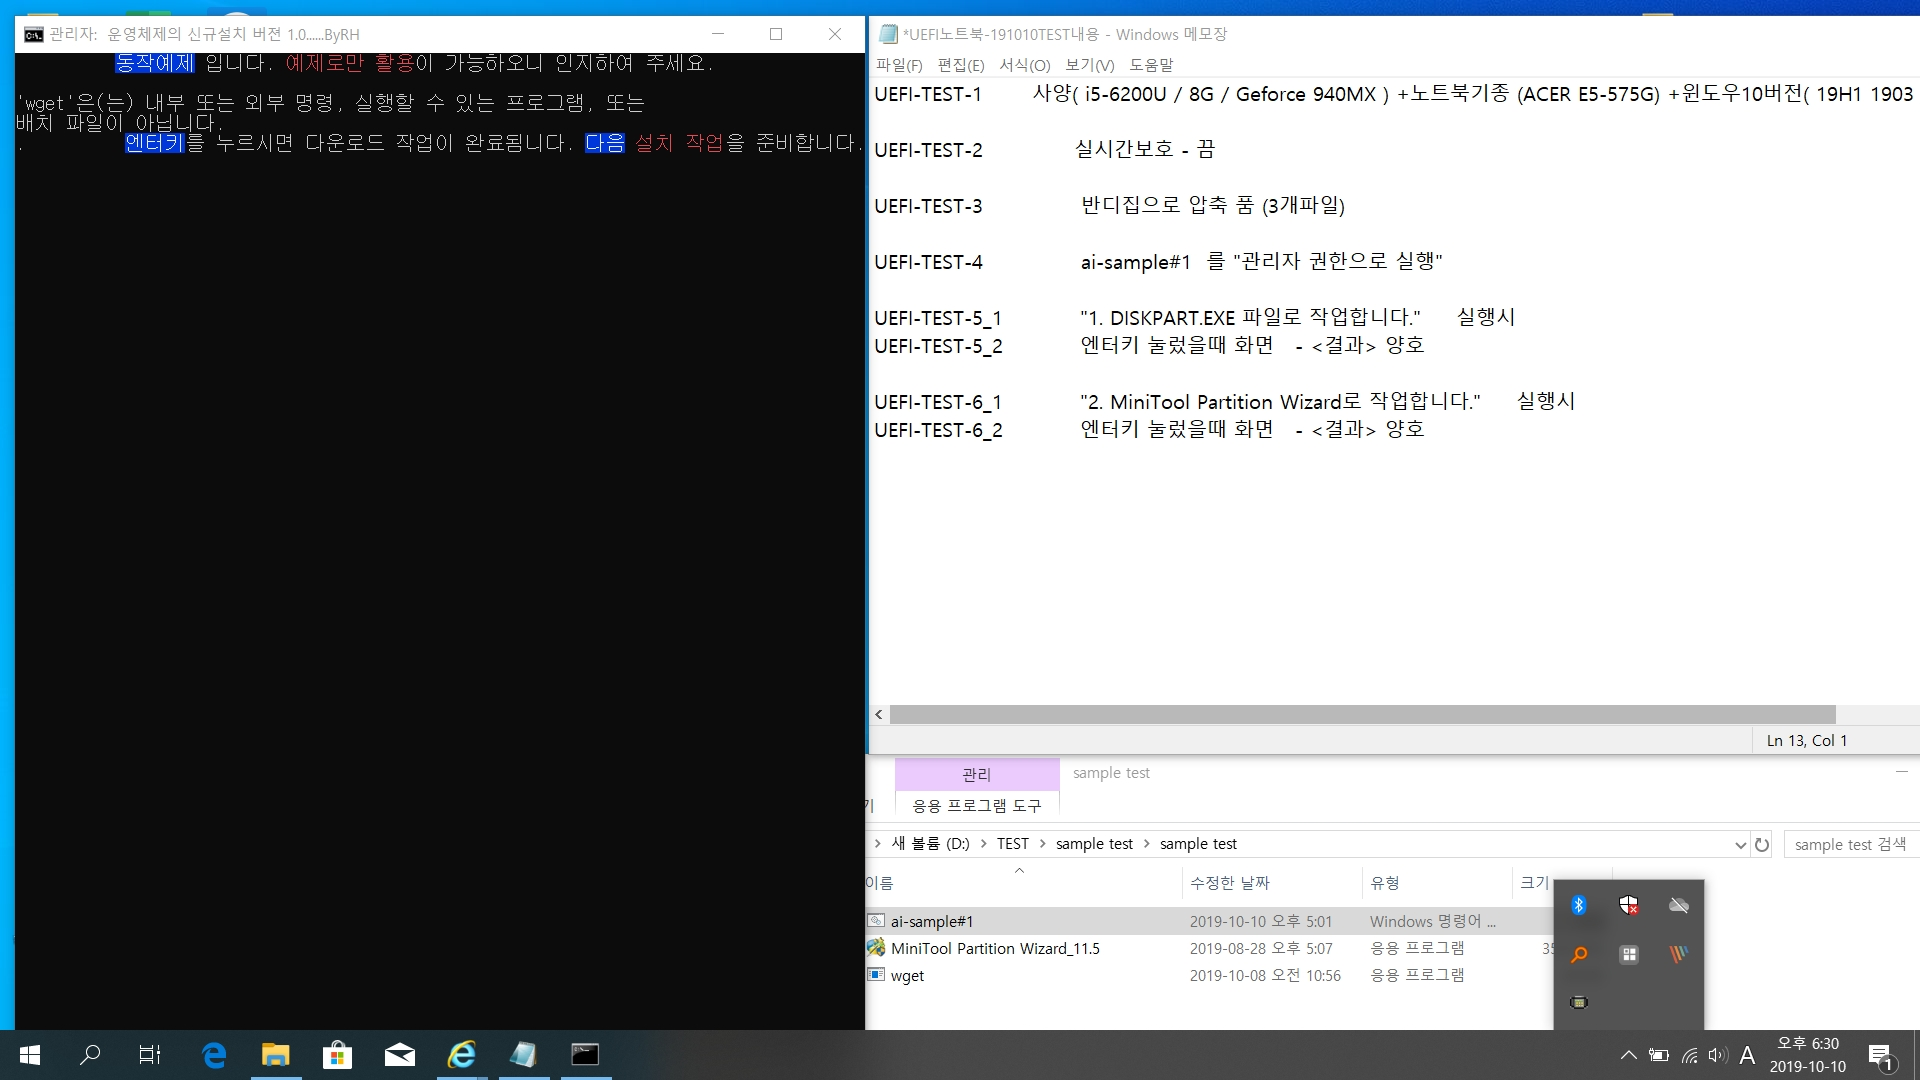 UEFI-TEST-6_2.jpg